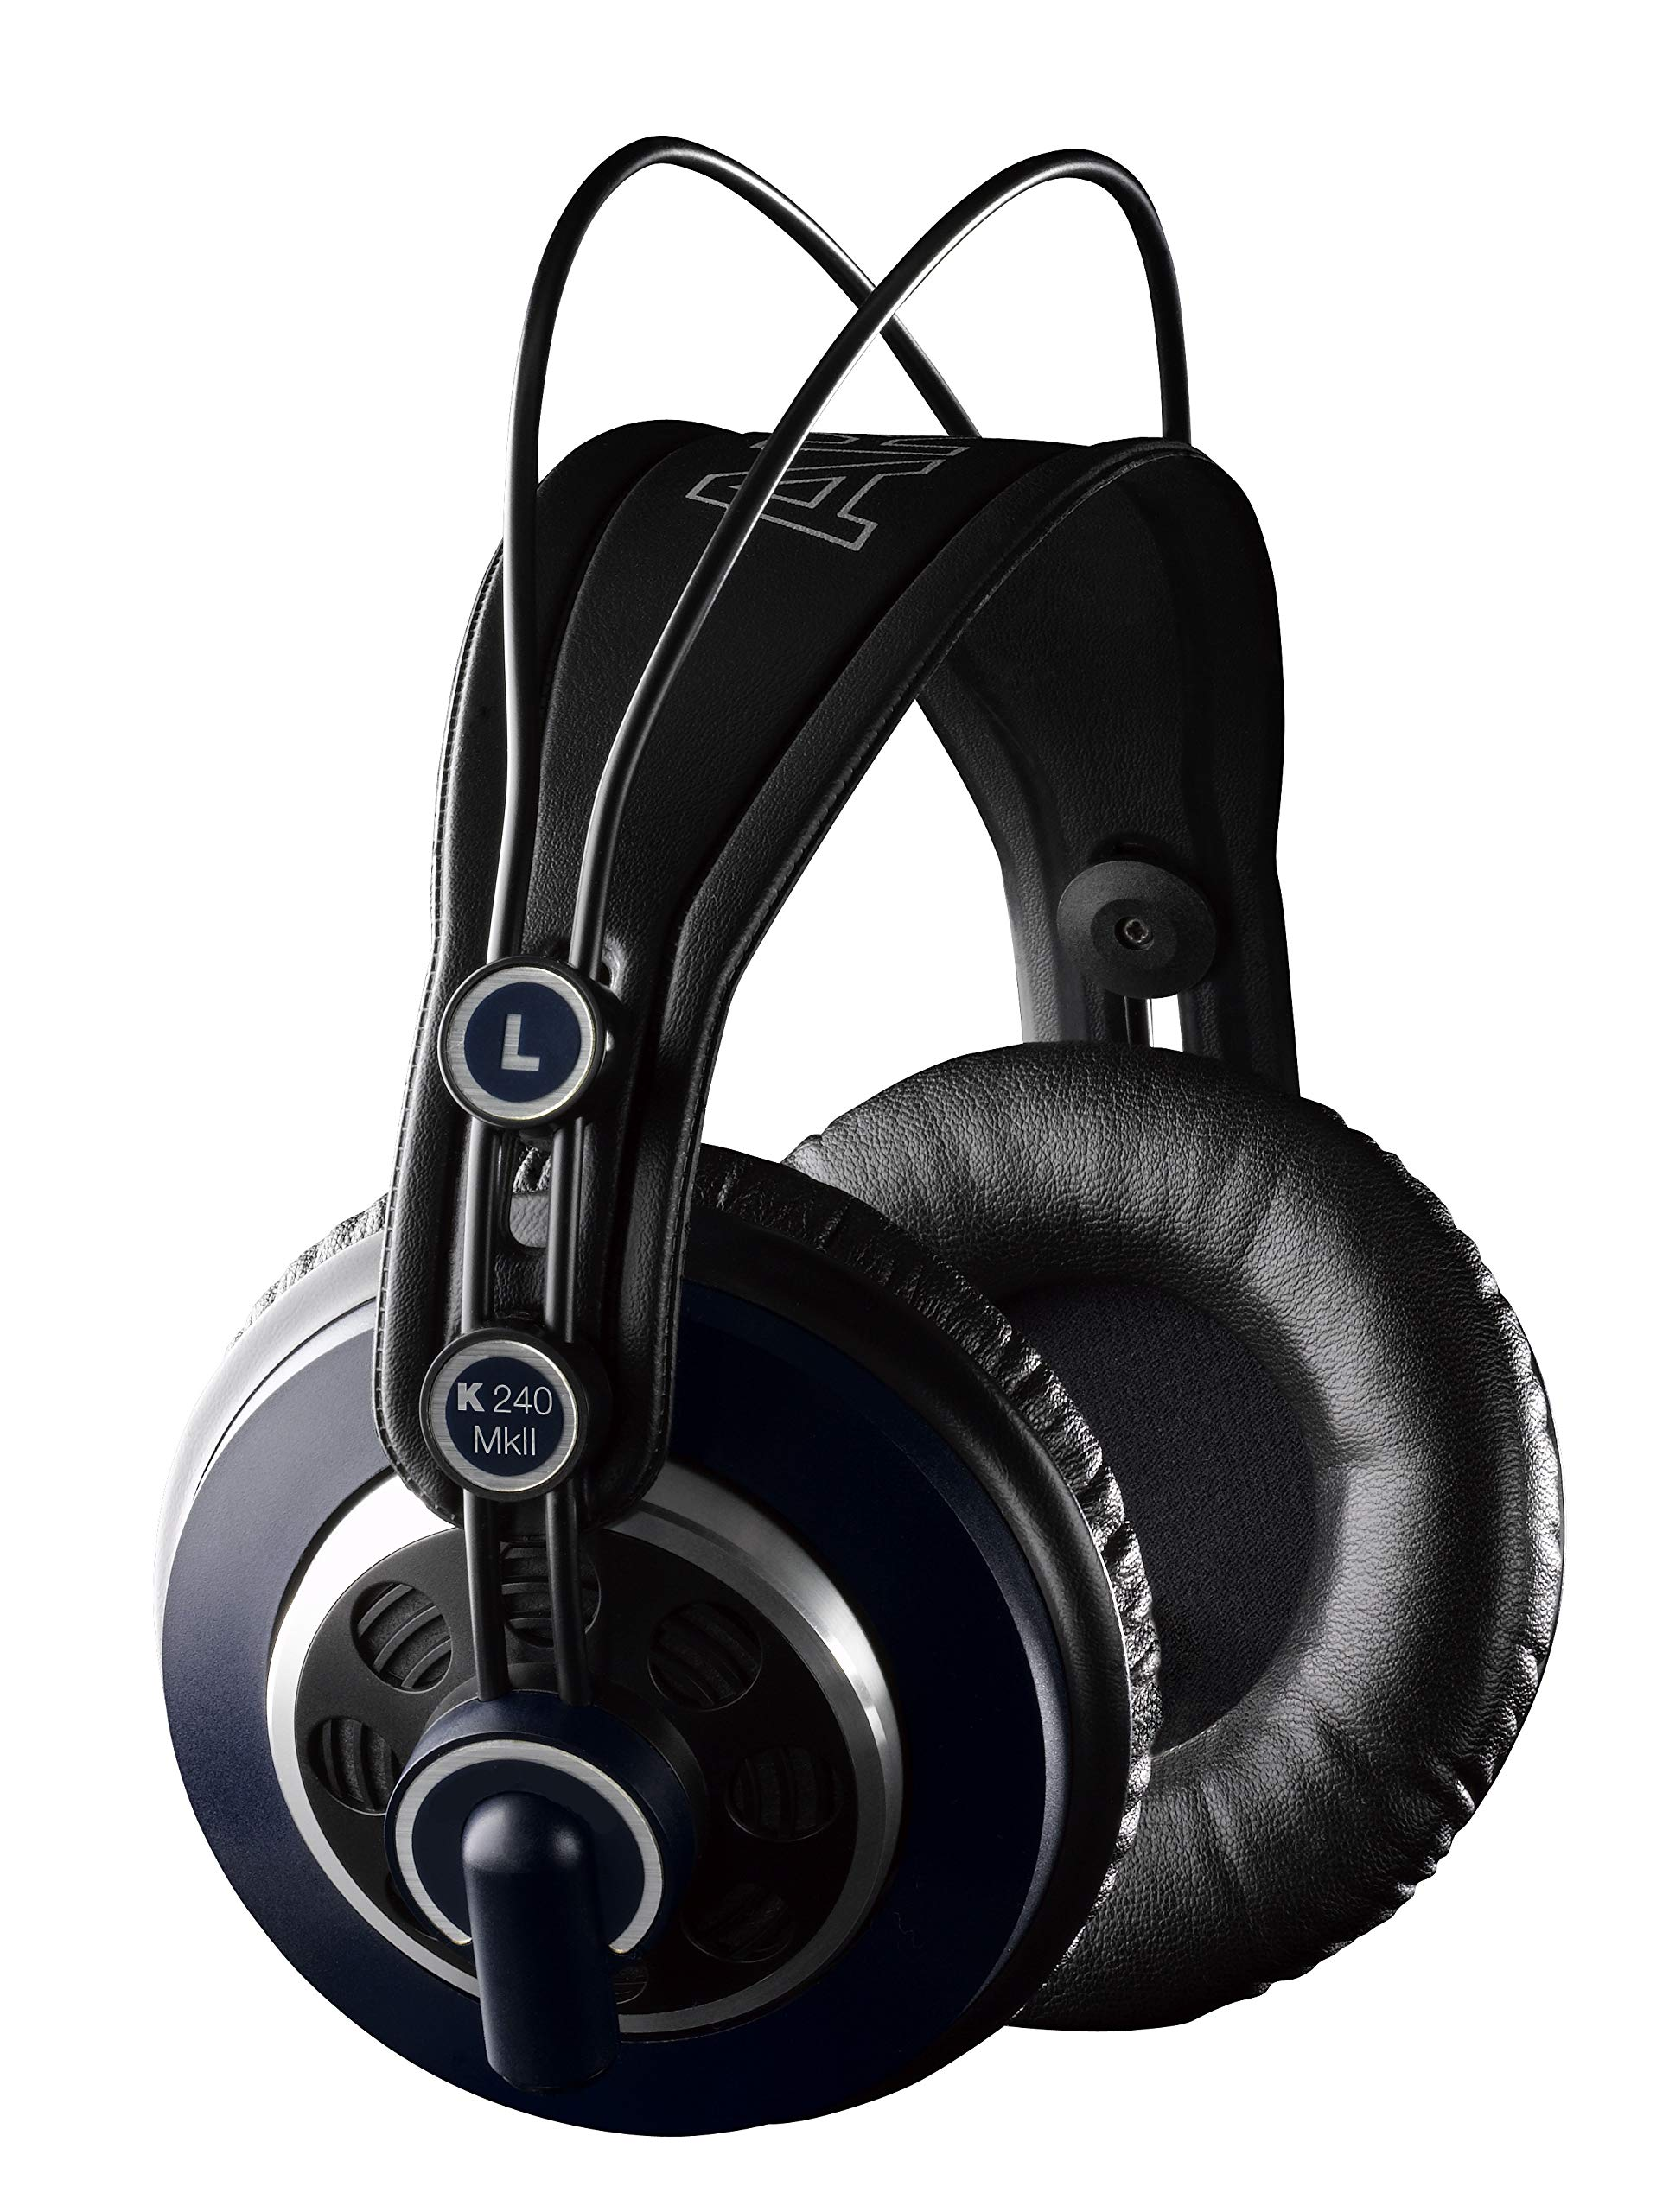 AKG Pro Audio K240 MKII Channel Studio Headphones product image